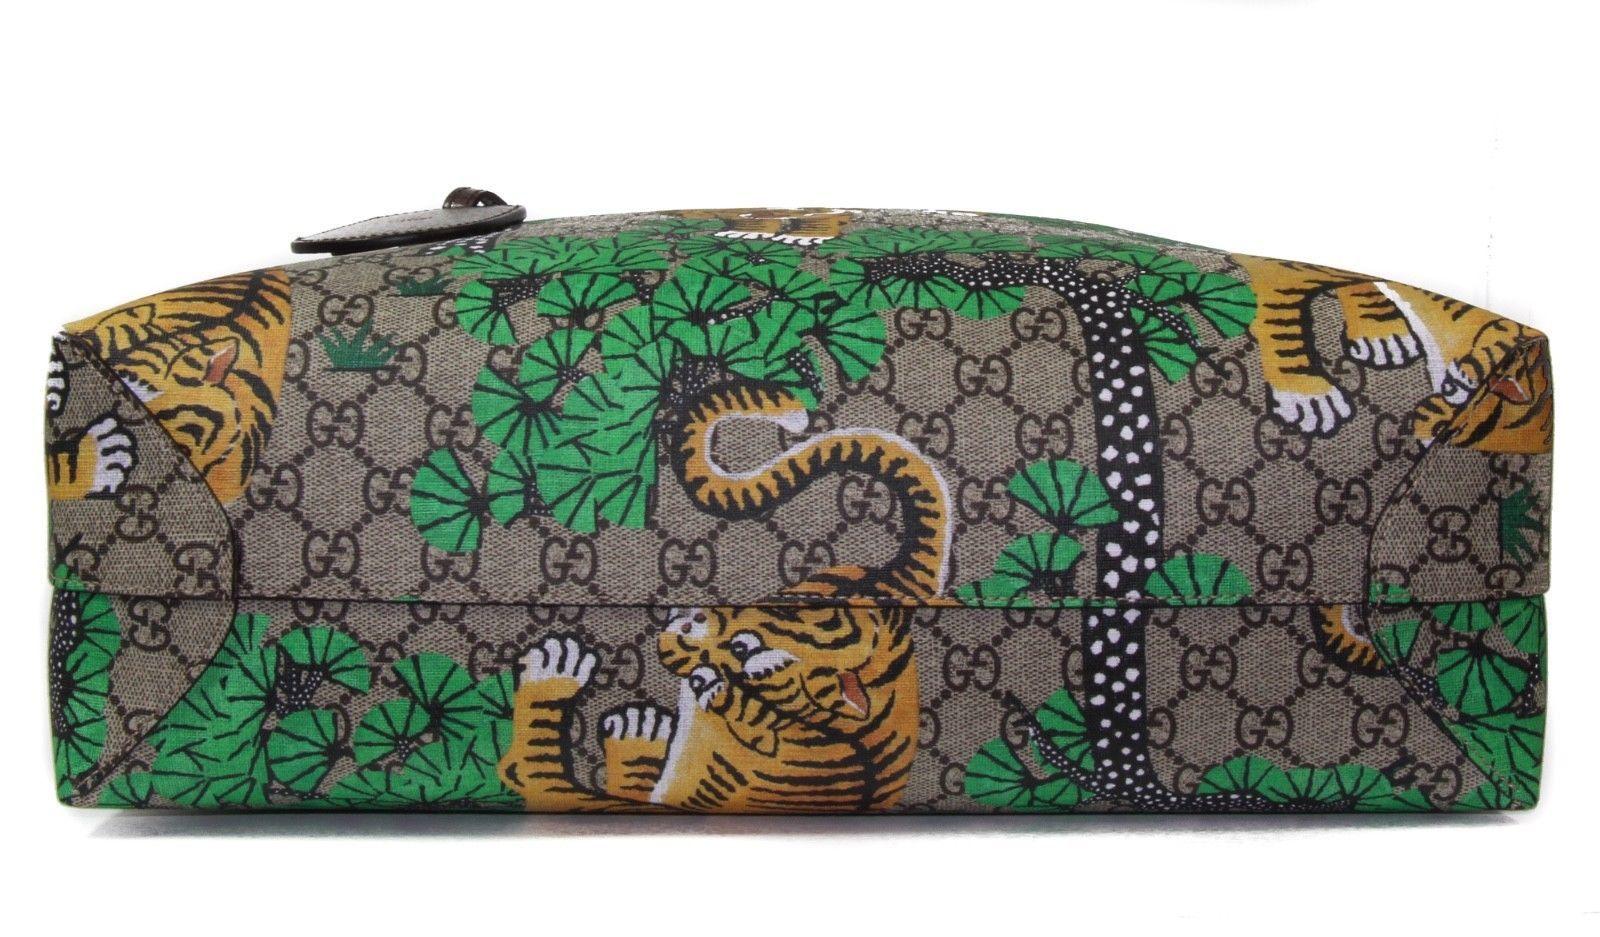 7df89de280b84 NWT GUCCI 412096 Bengal GG Supreme Tote Bag